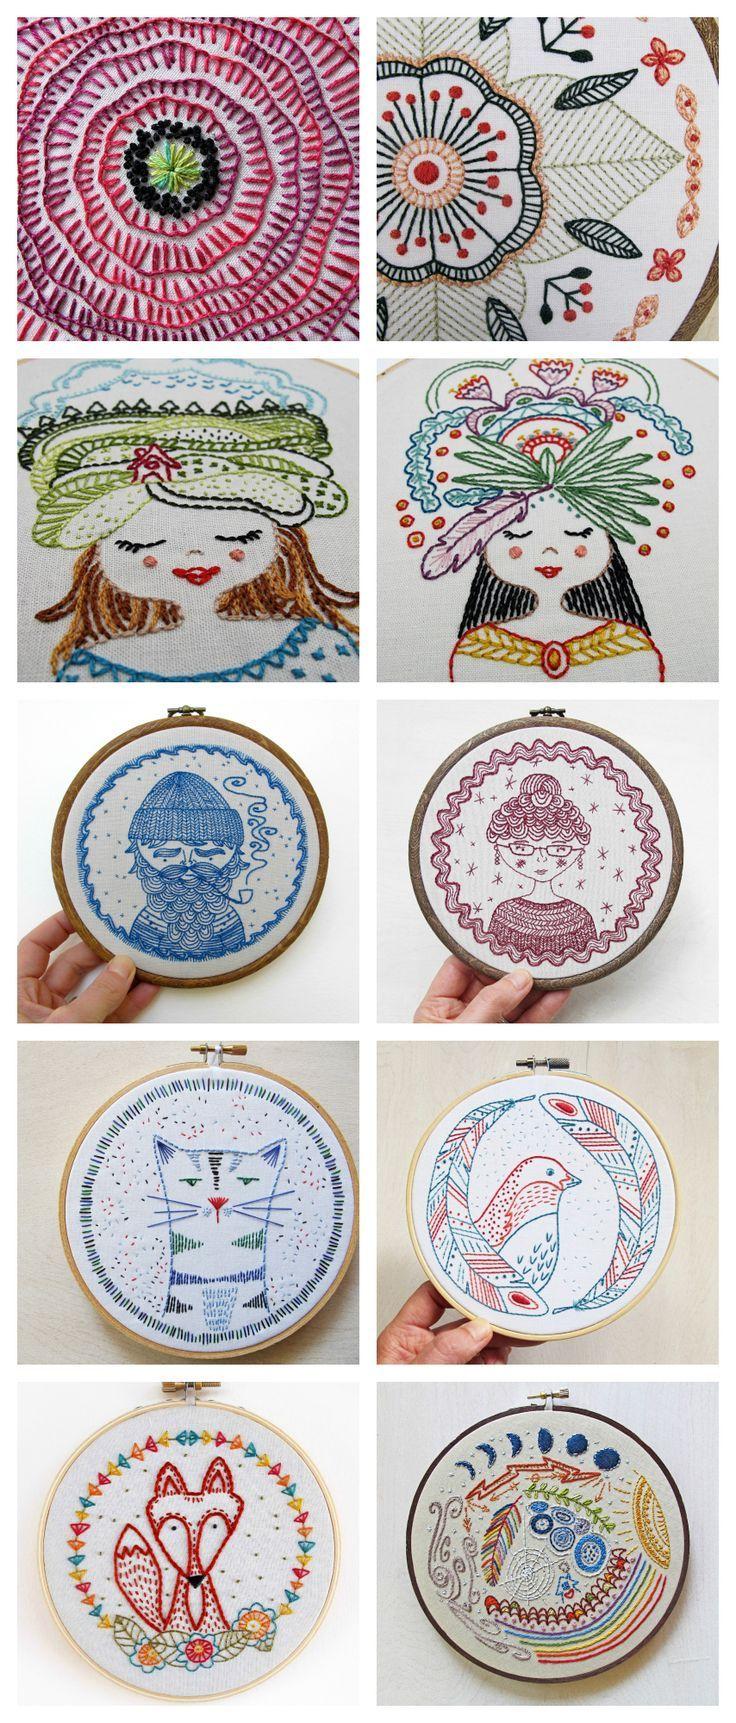 cozyblue embroidery patterns | Hobi | Pinterest | Bordado, Hilo y ...